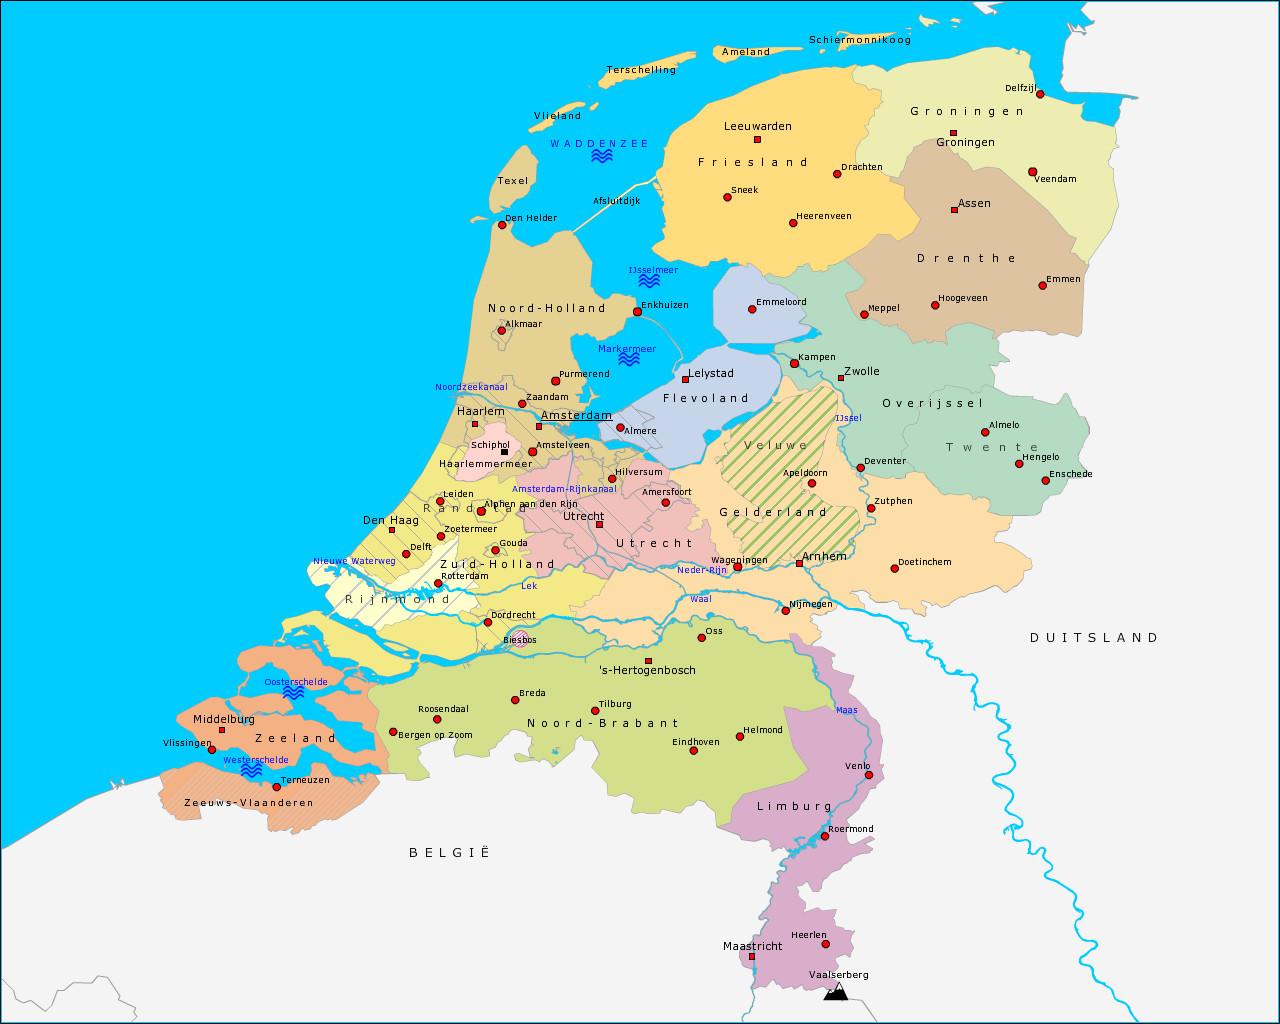 nederland-cito-100